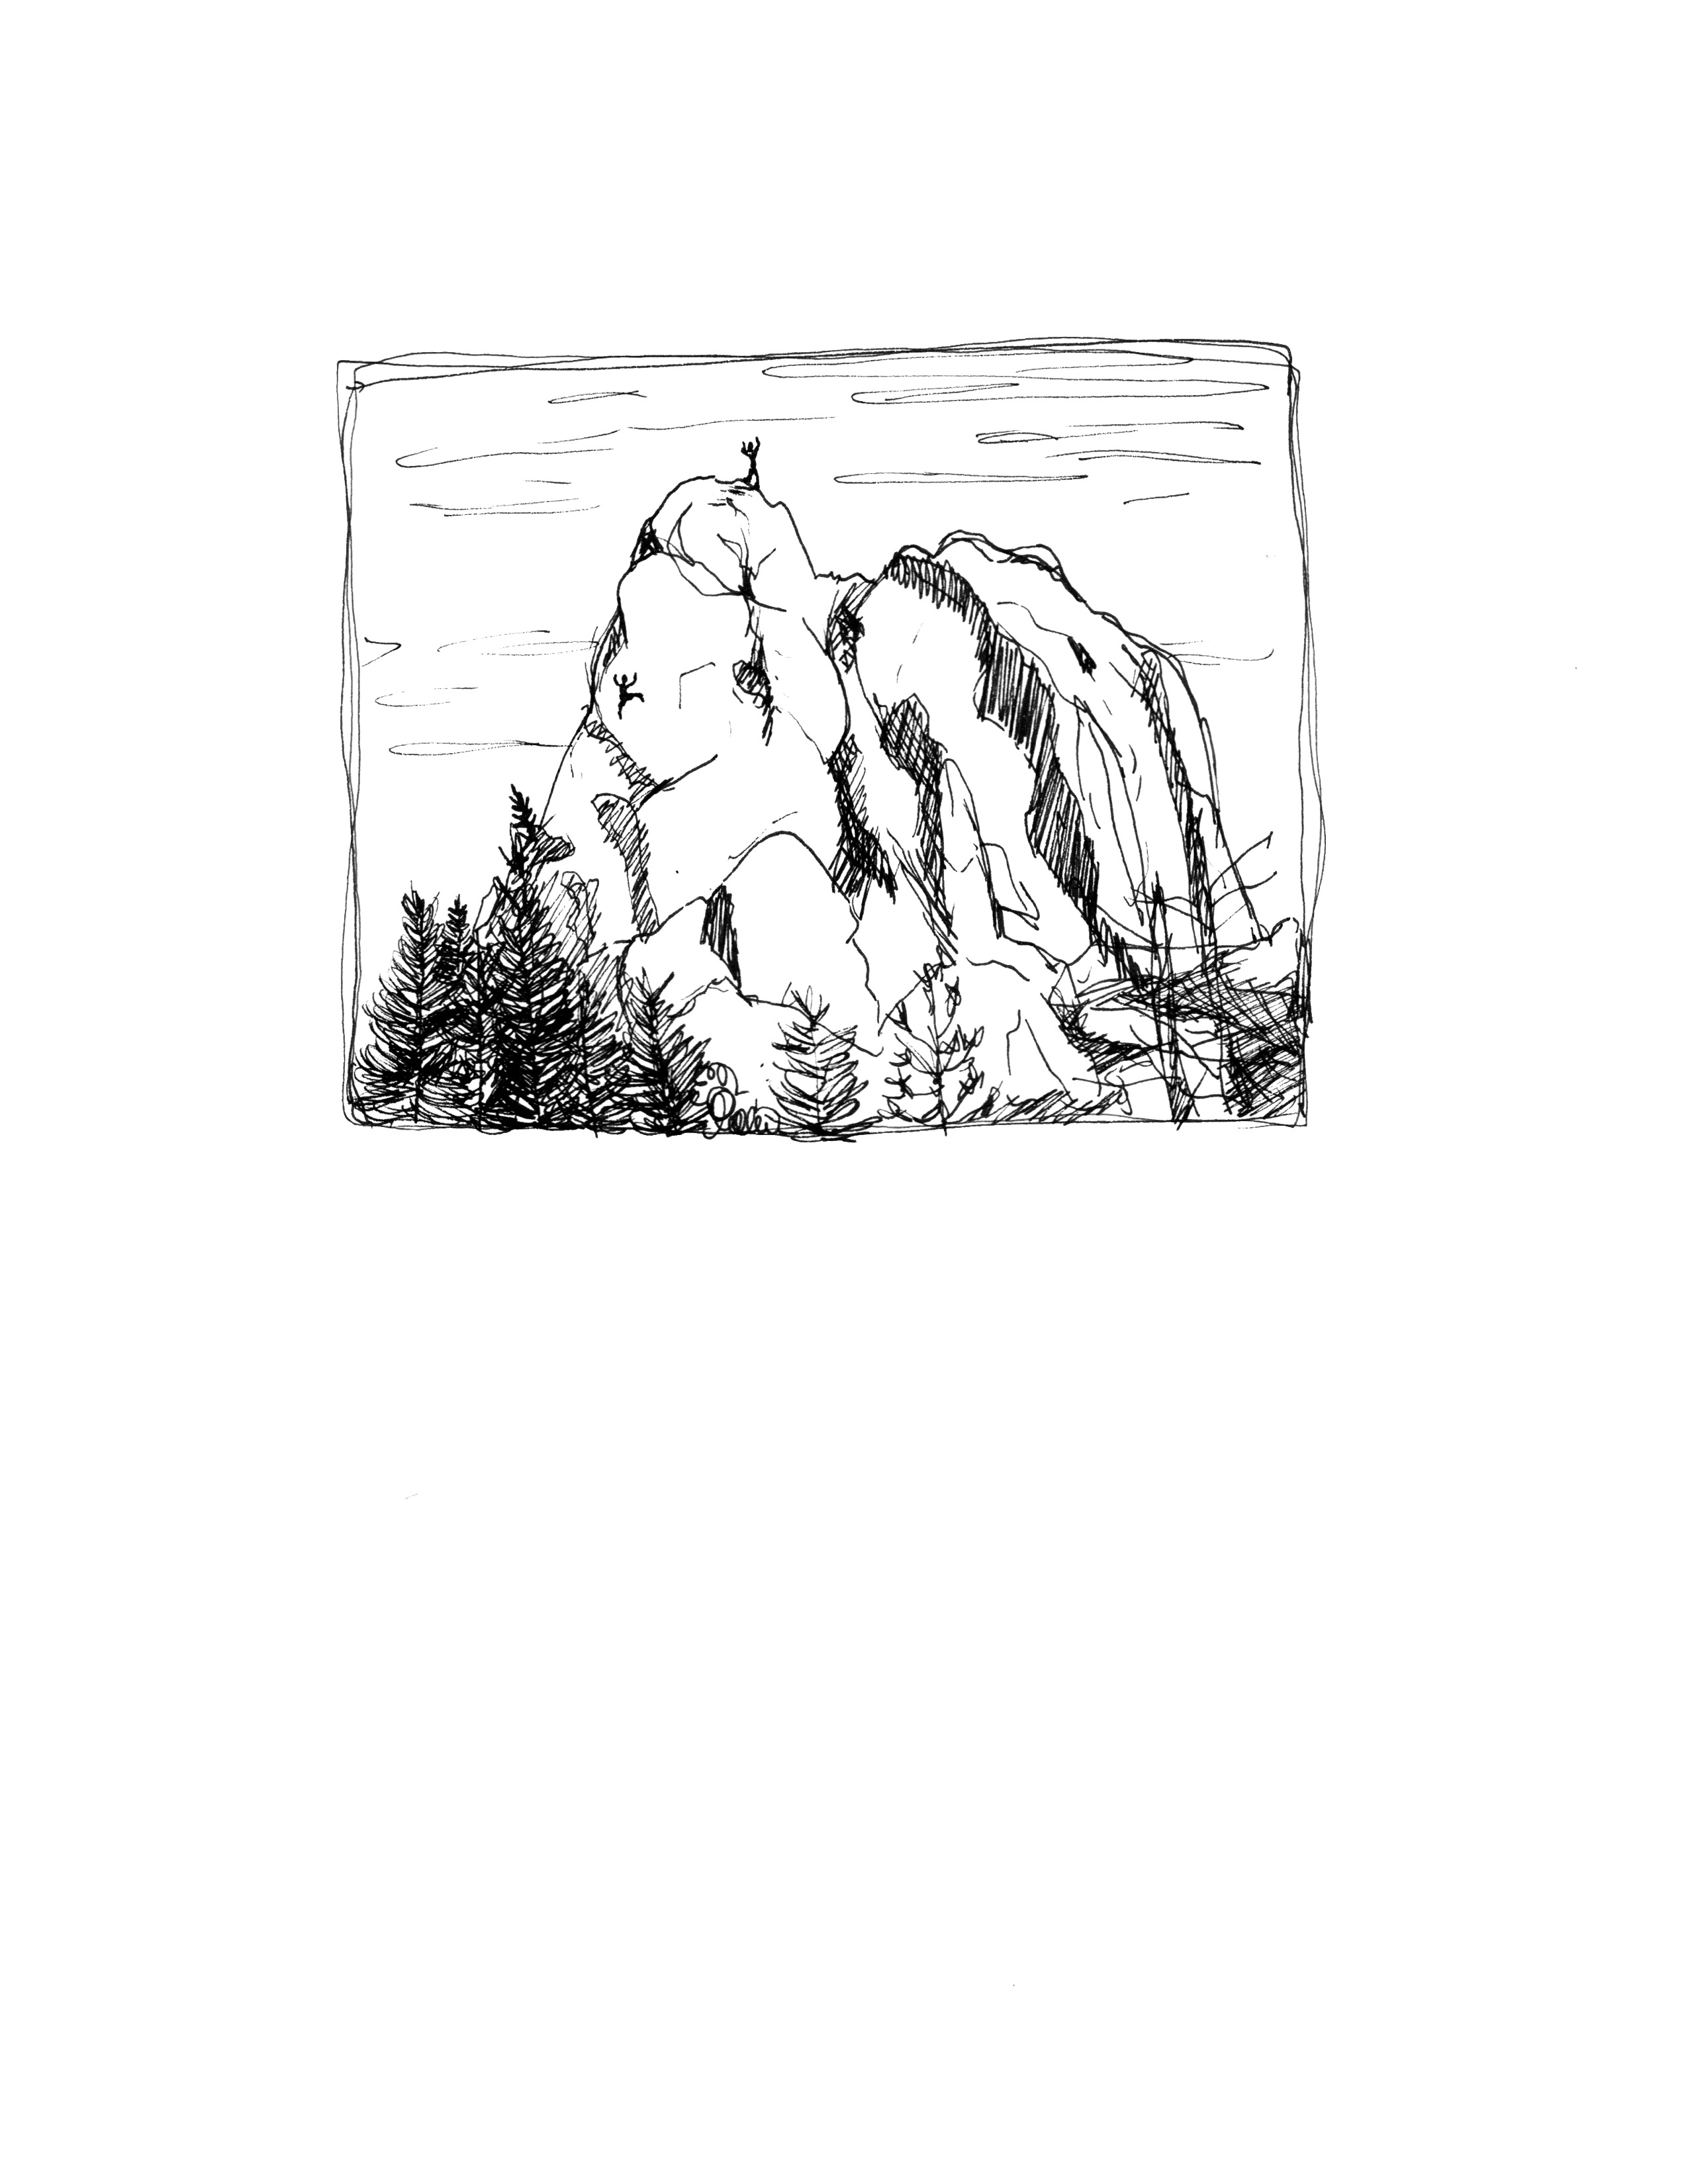 Mountiain Climbers